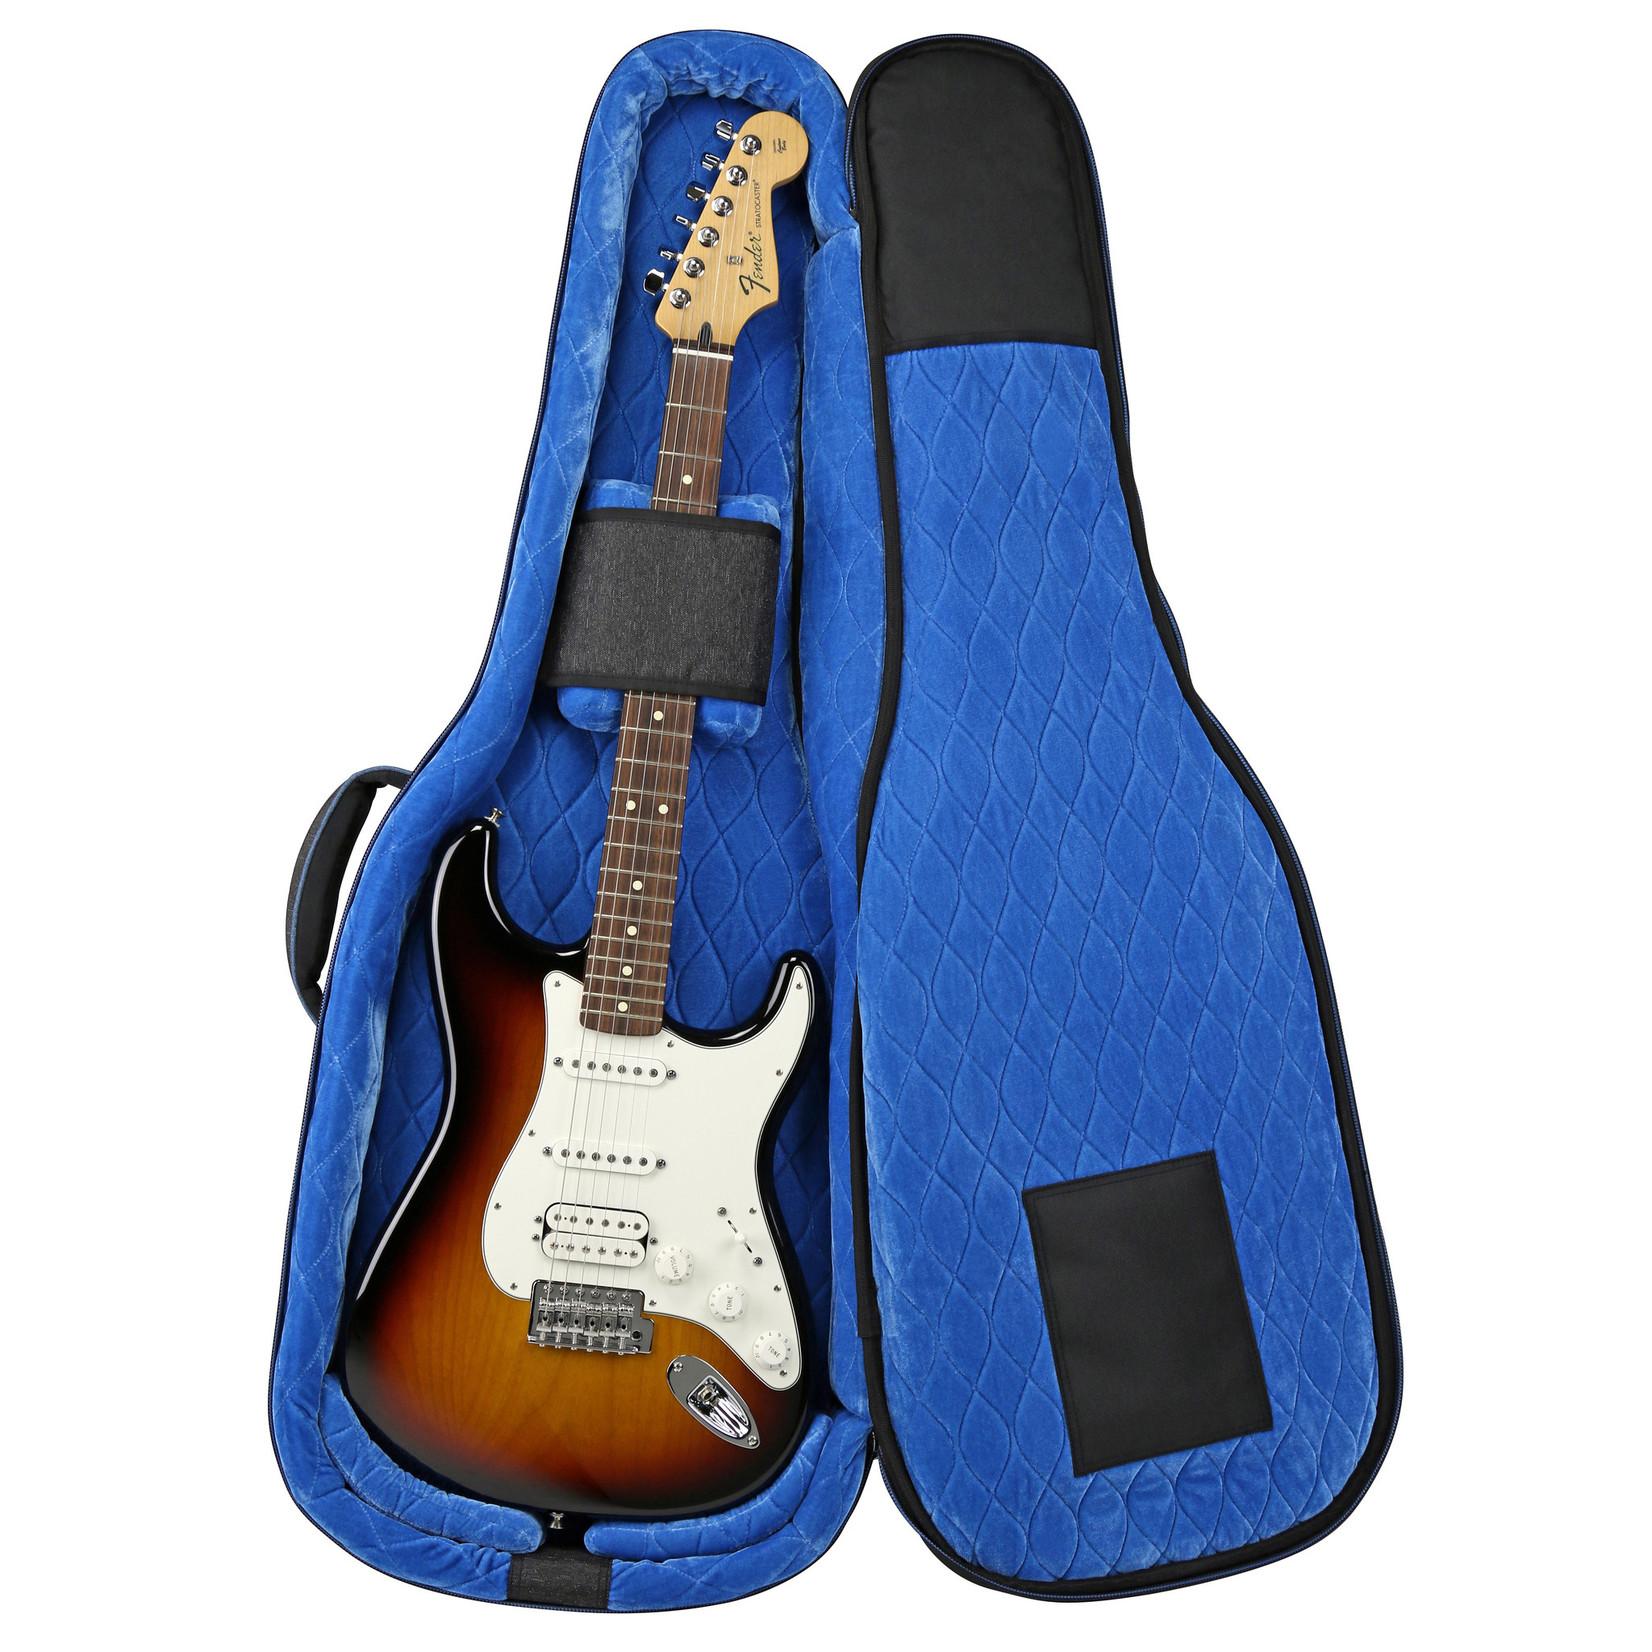 Reunion Blues Reunion Blues RB Continental Voyager Electric Guitar Case (Hybrid), RBCE1